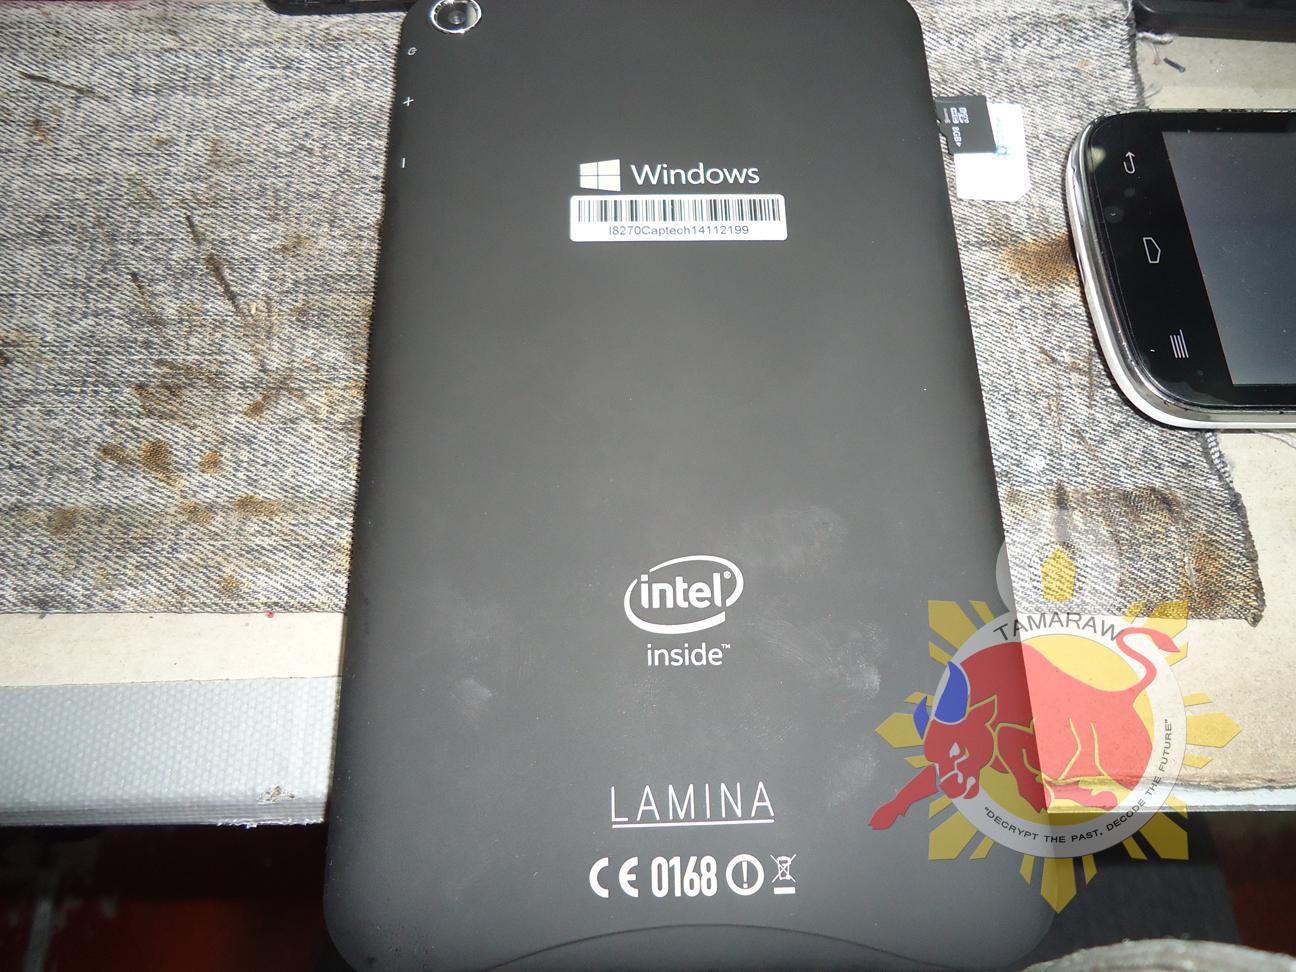 TAMARAW8: Windows Lamina Tablet Forgotten Password, Reset Solution